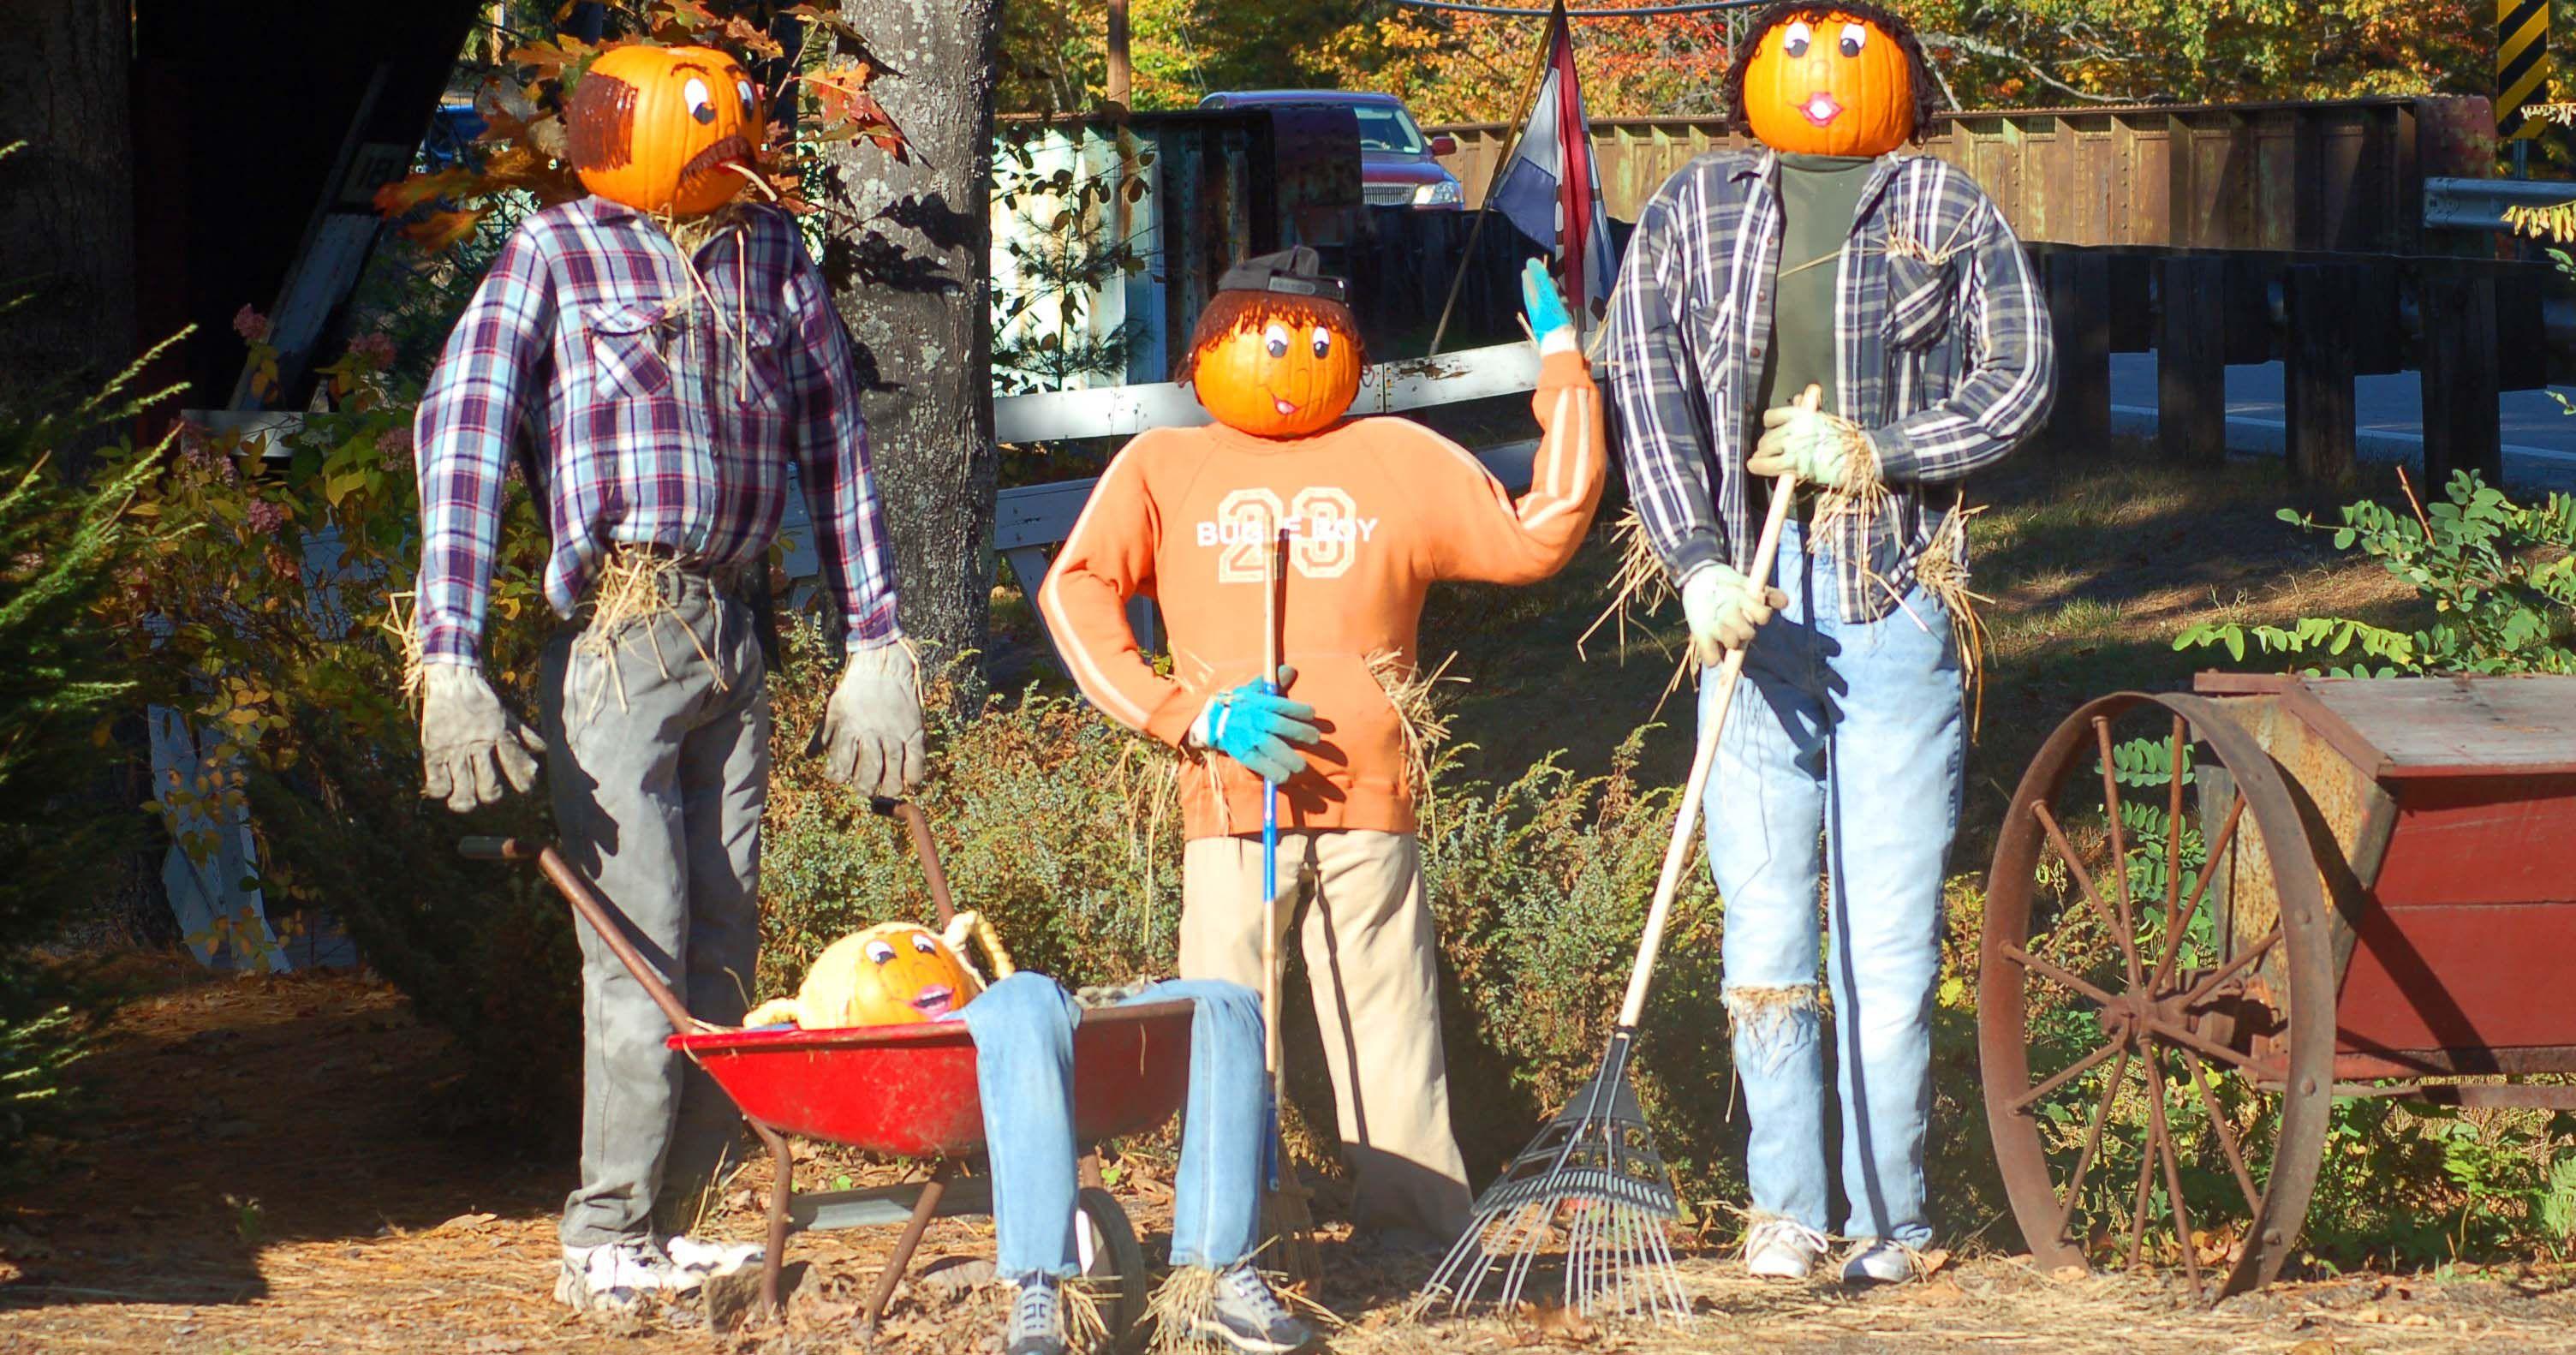 three scarecrows doing yard work